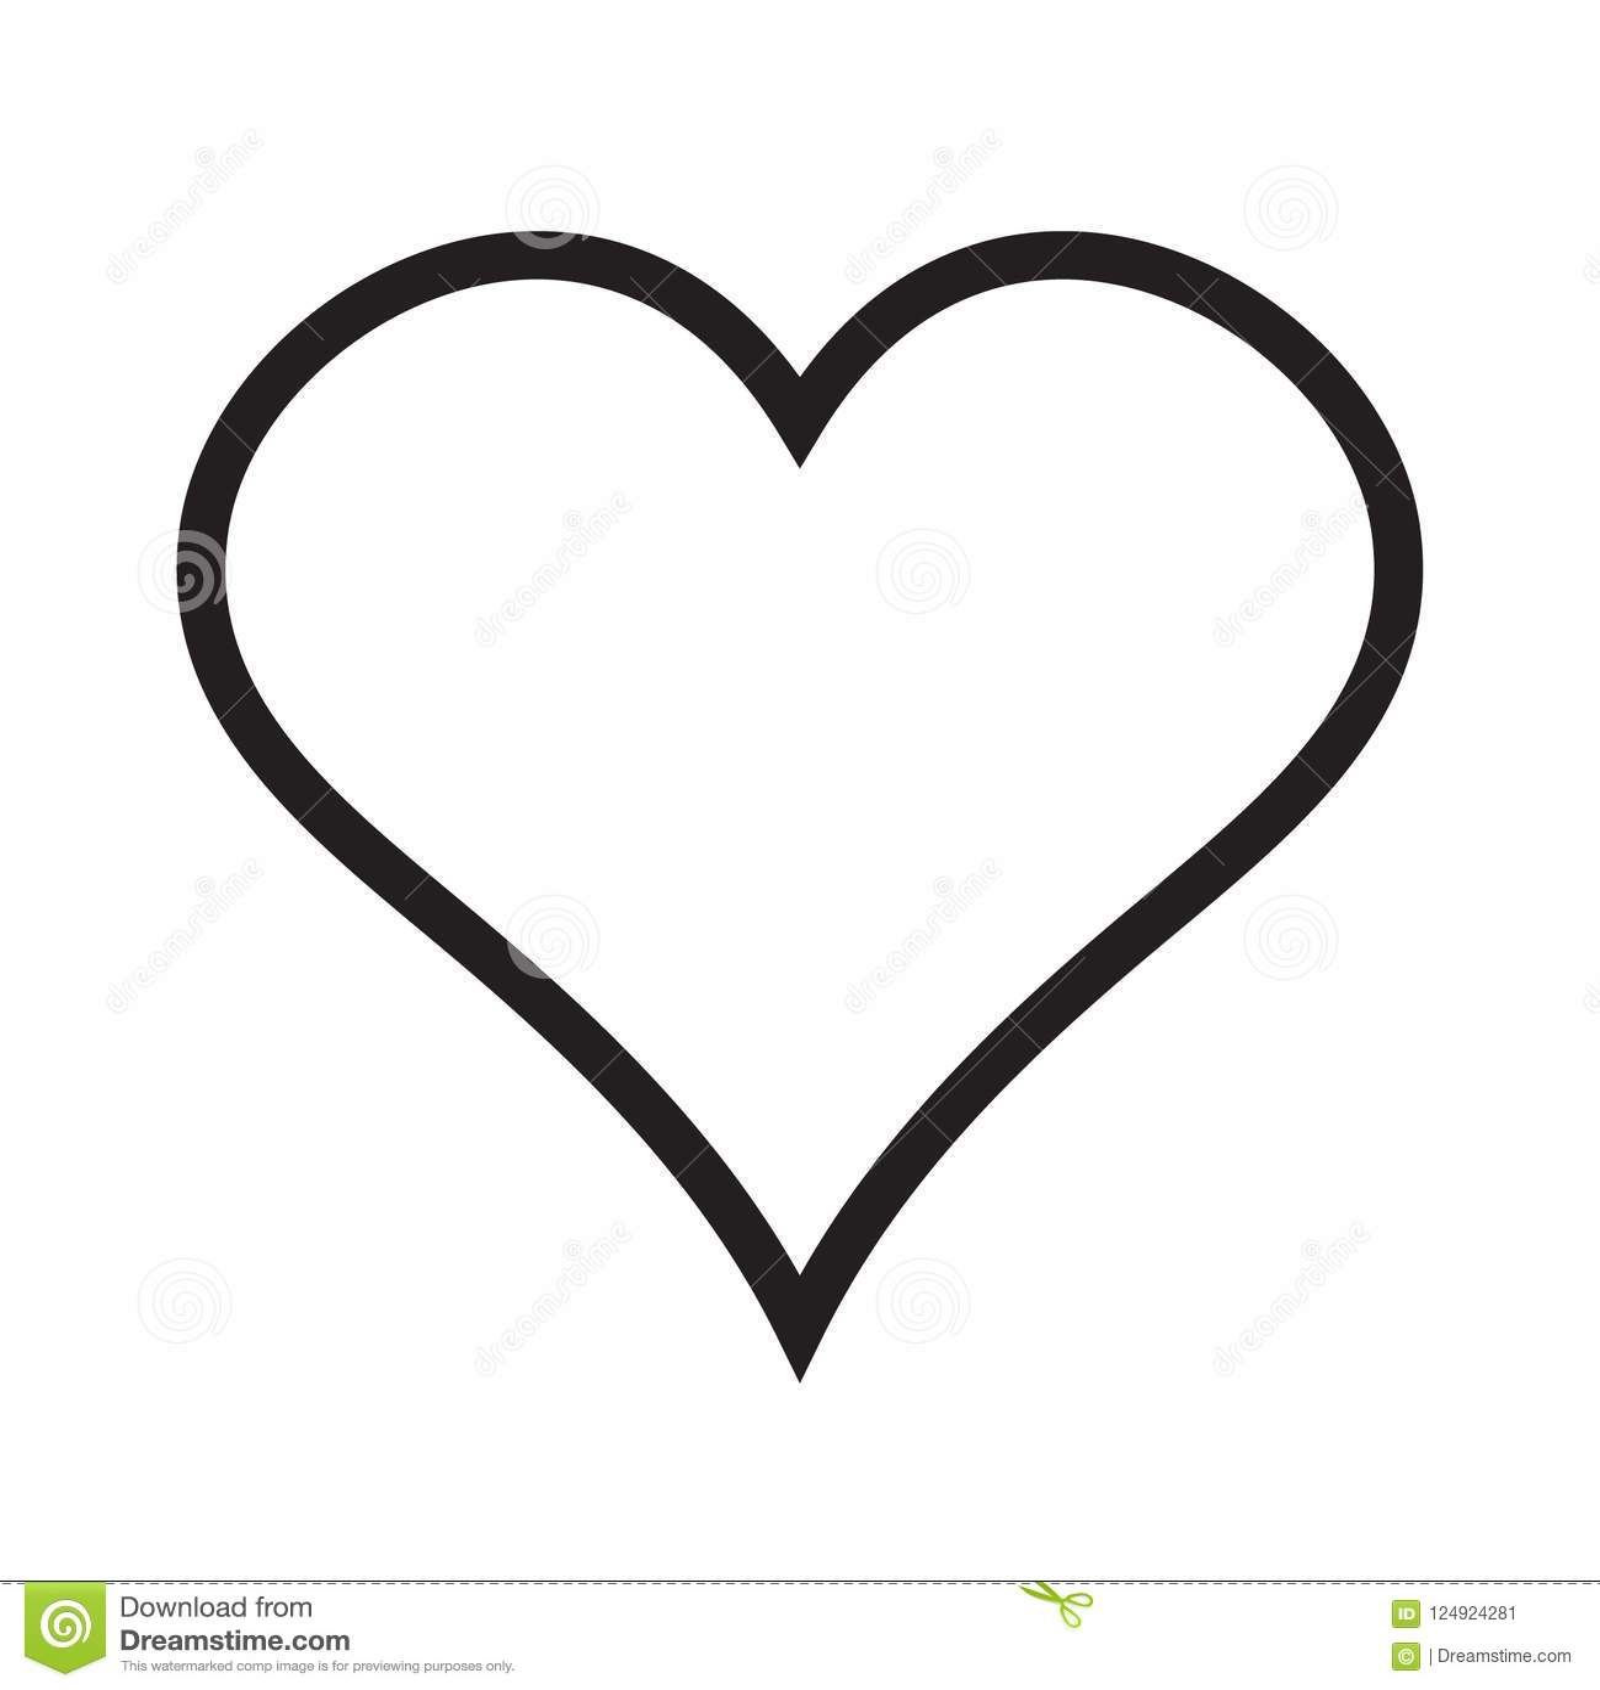 Heart linear icon, love icon